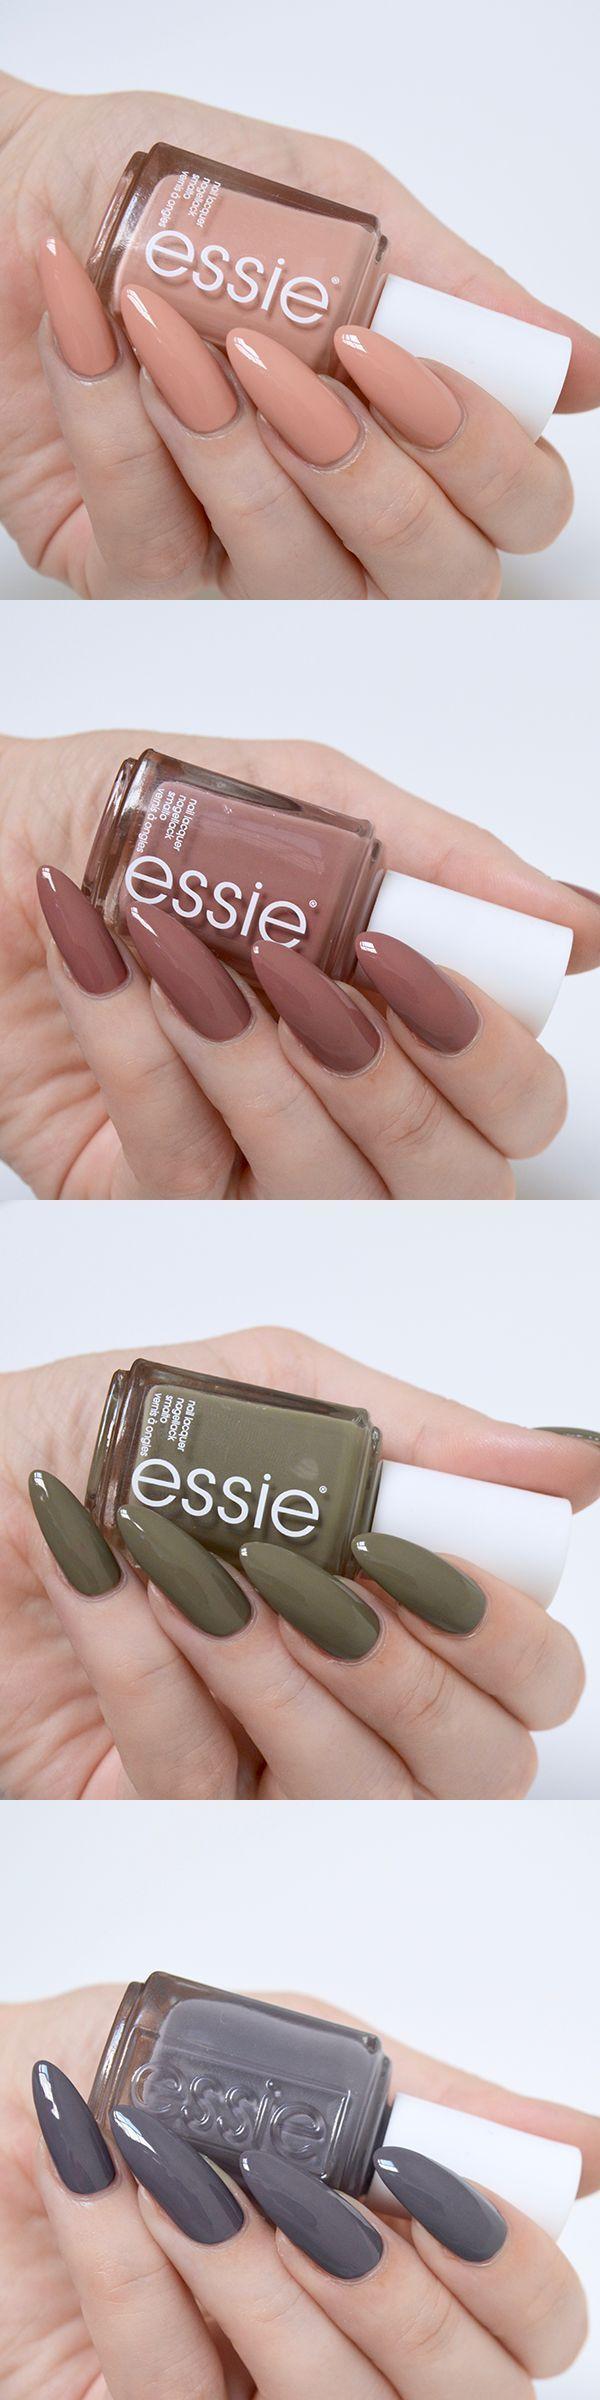 716 best Manicures & Nail Art - Talonted Lex images on Pinterest ...